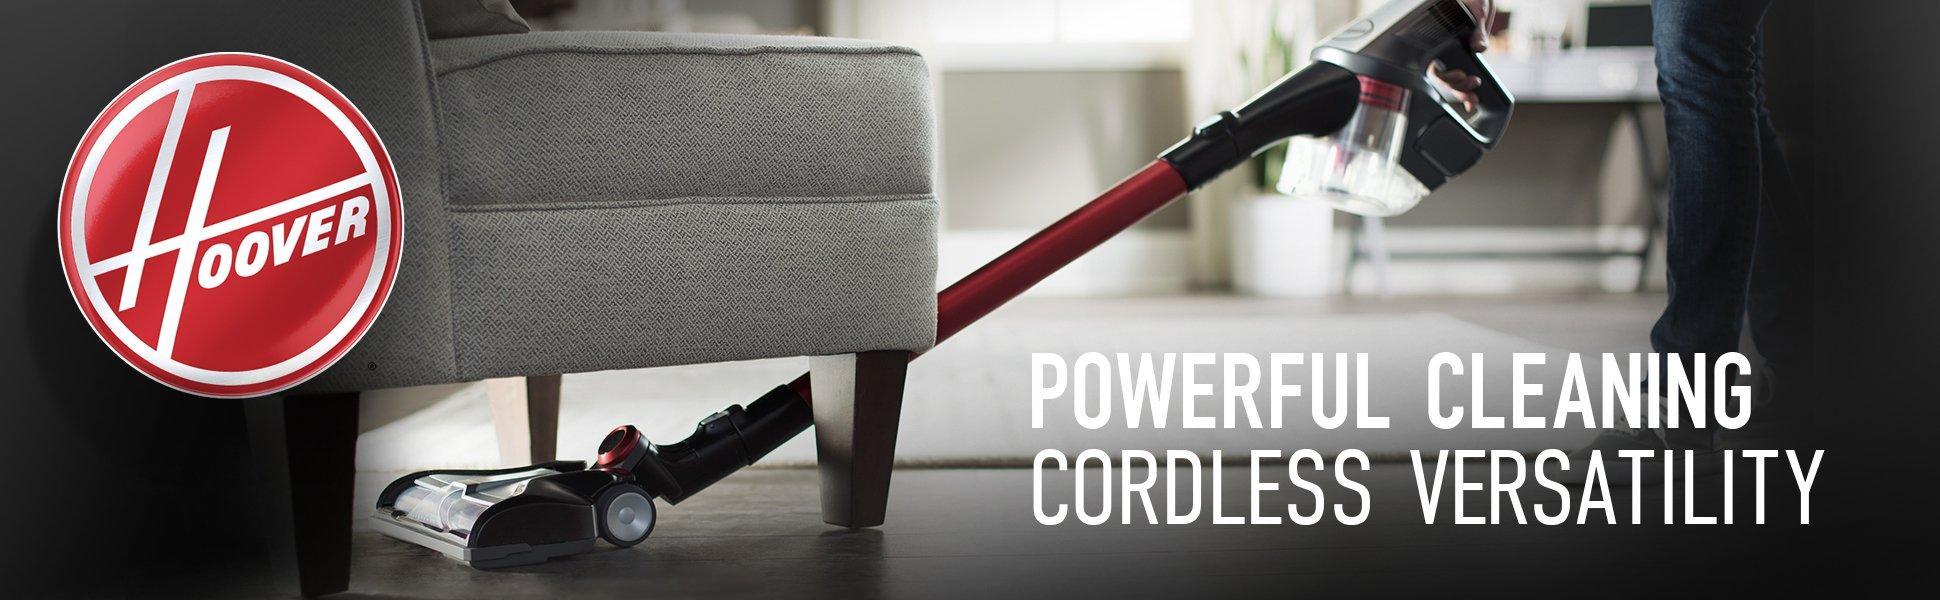 fusion cordless stick vacuum bh53100. Black Bedroom Furniture Sets. Home Design Ideas